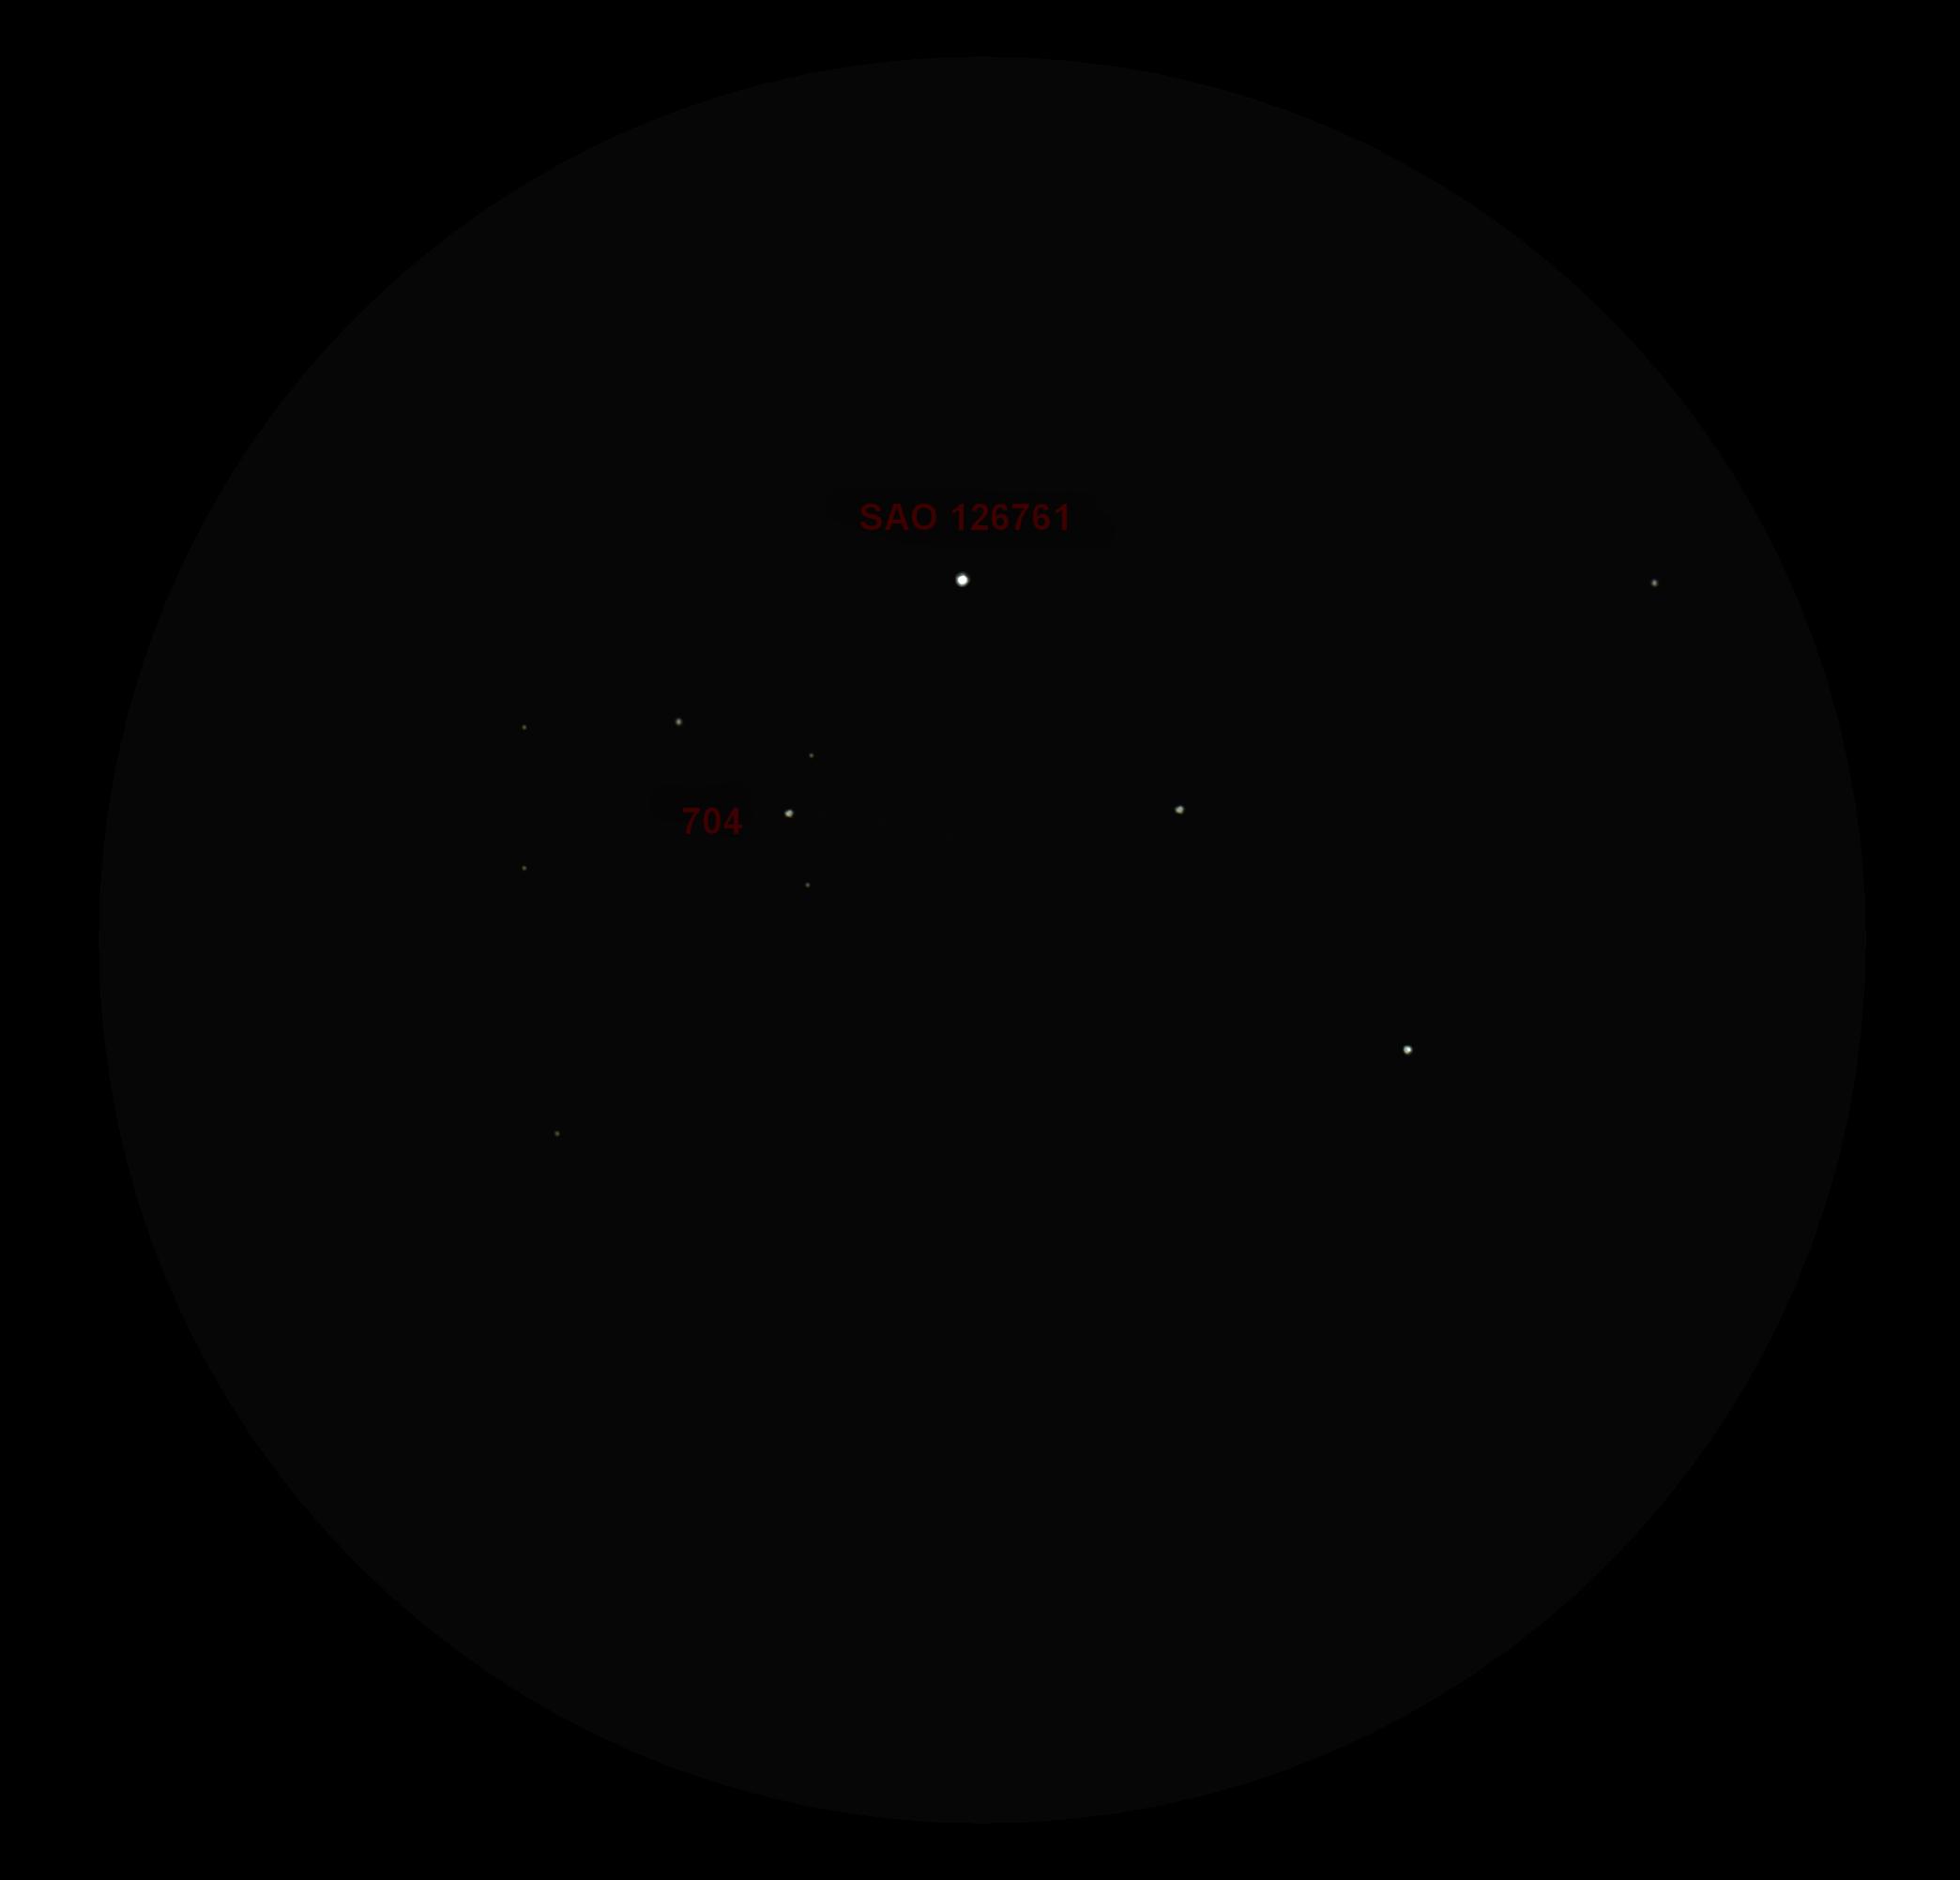 asteroid 704 Interamnia